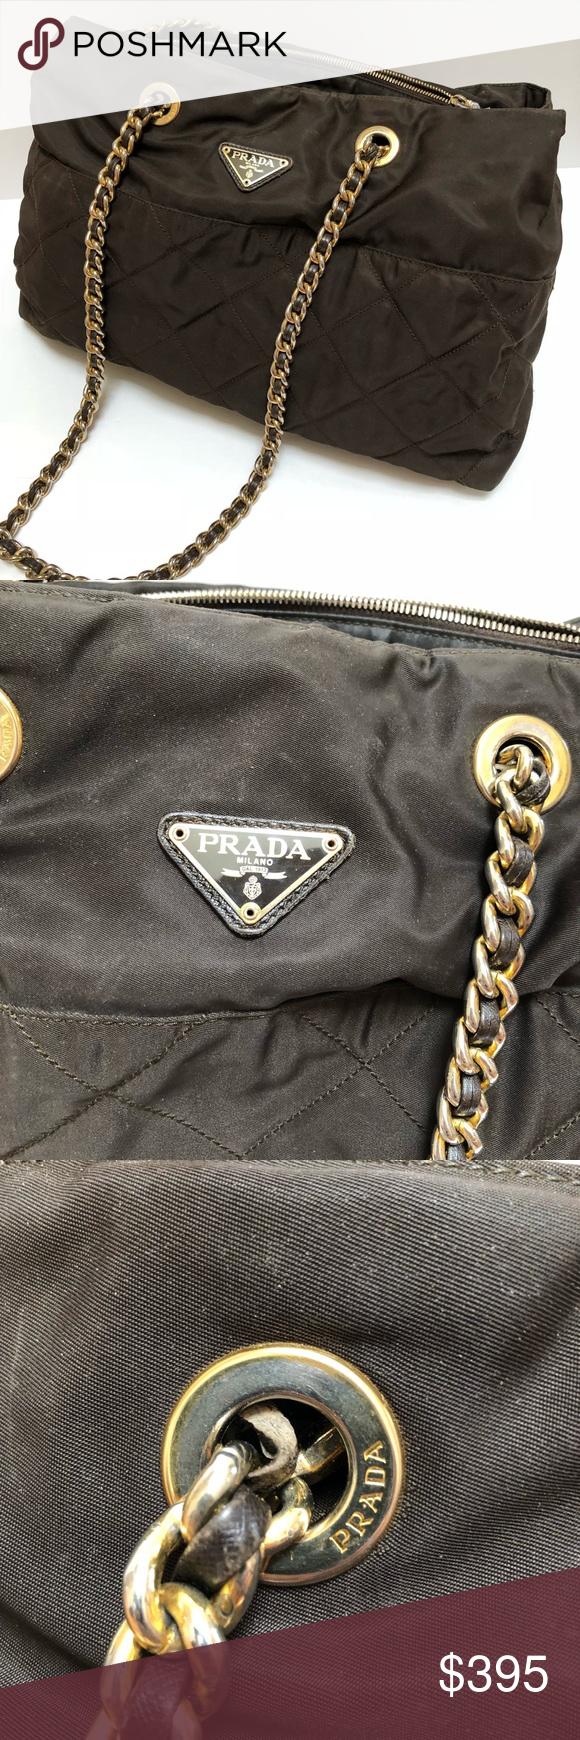 a28587dca14bdc Authentic Prada nylon chain shoulder bag